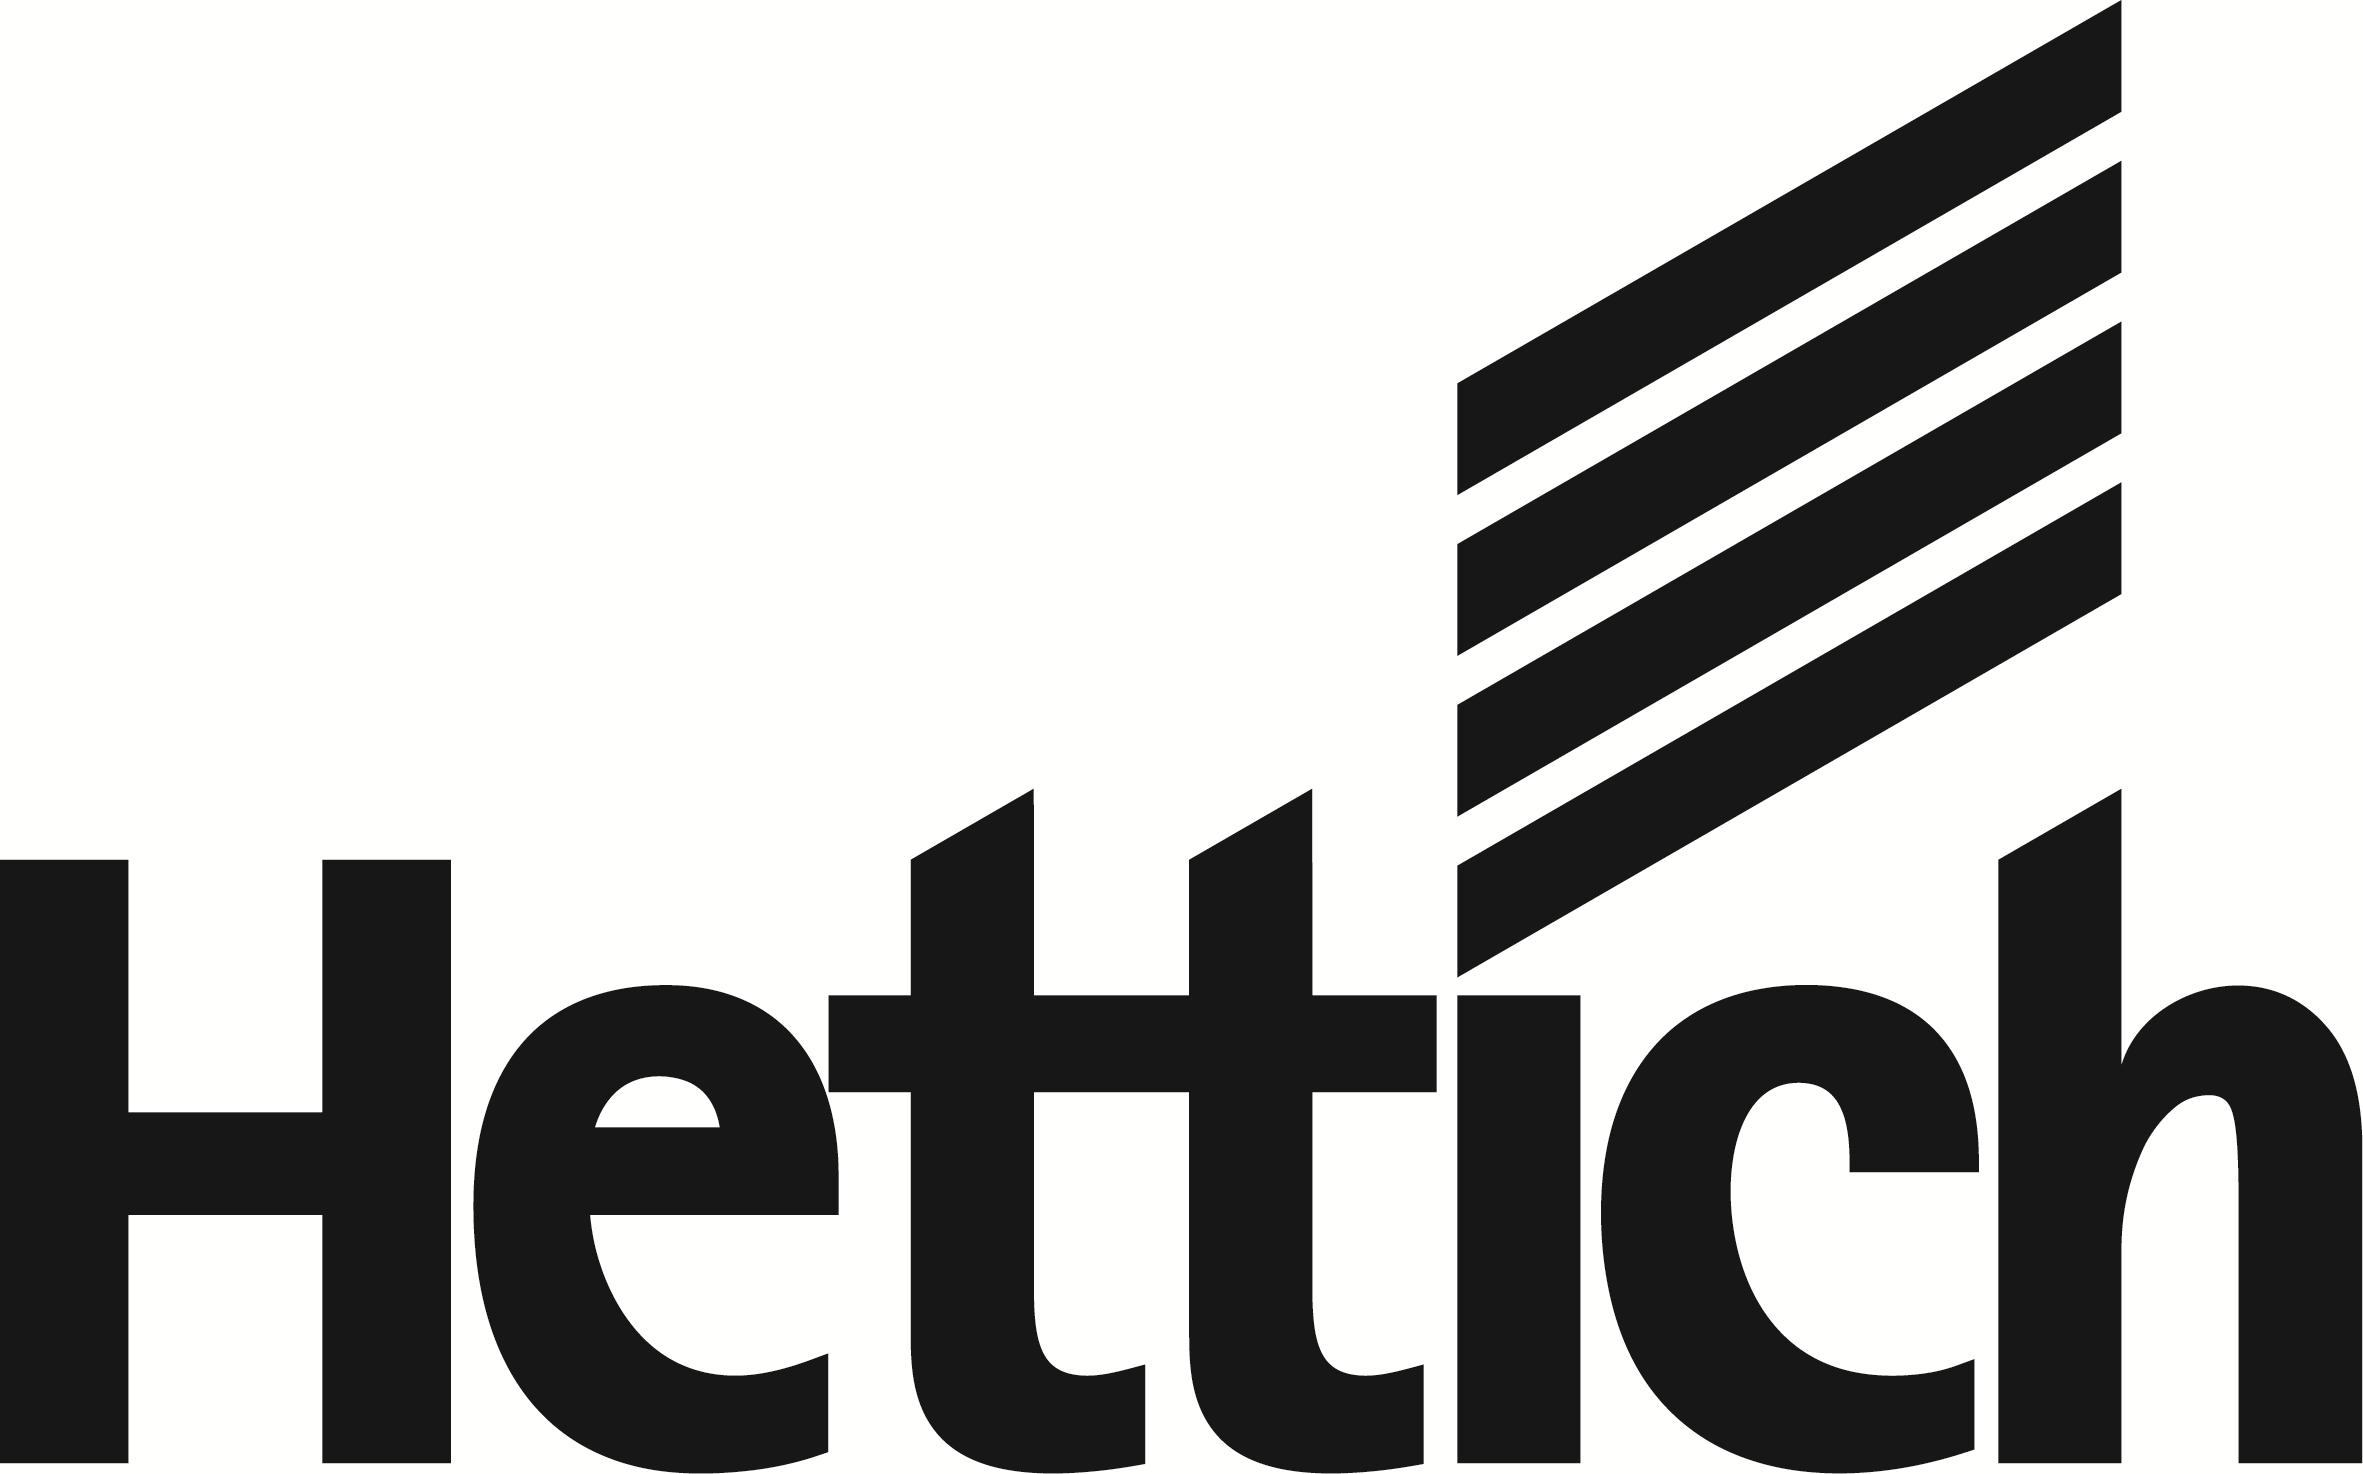 Inspiracje Hettich Polska